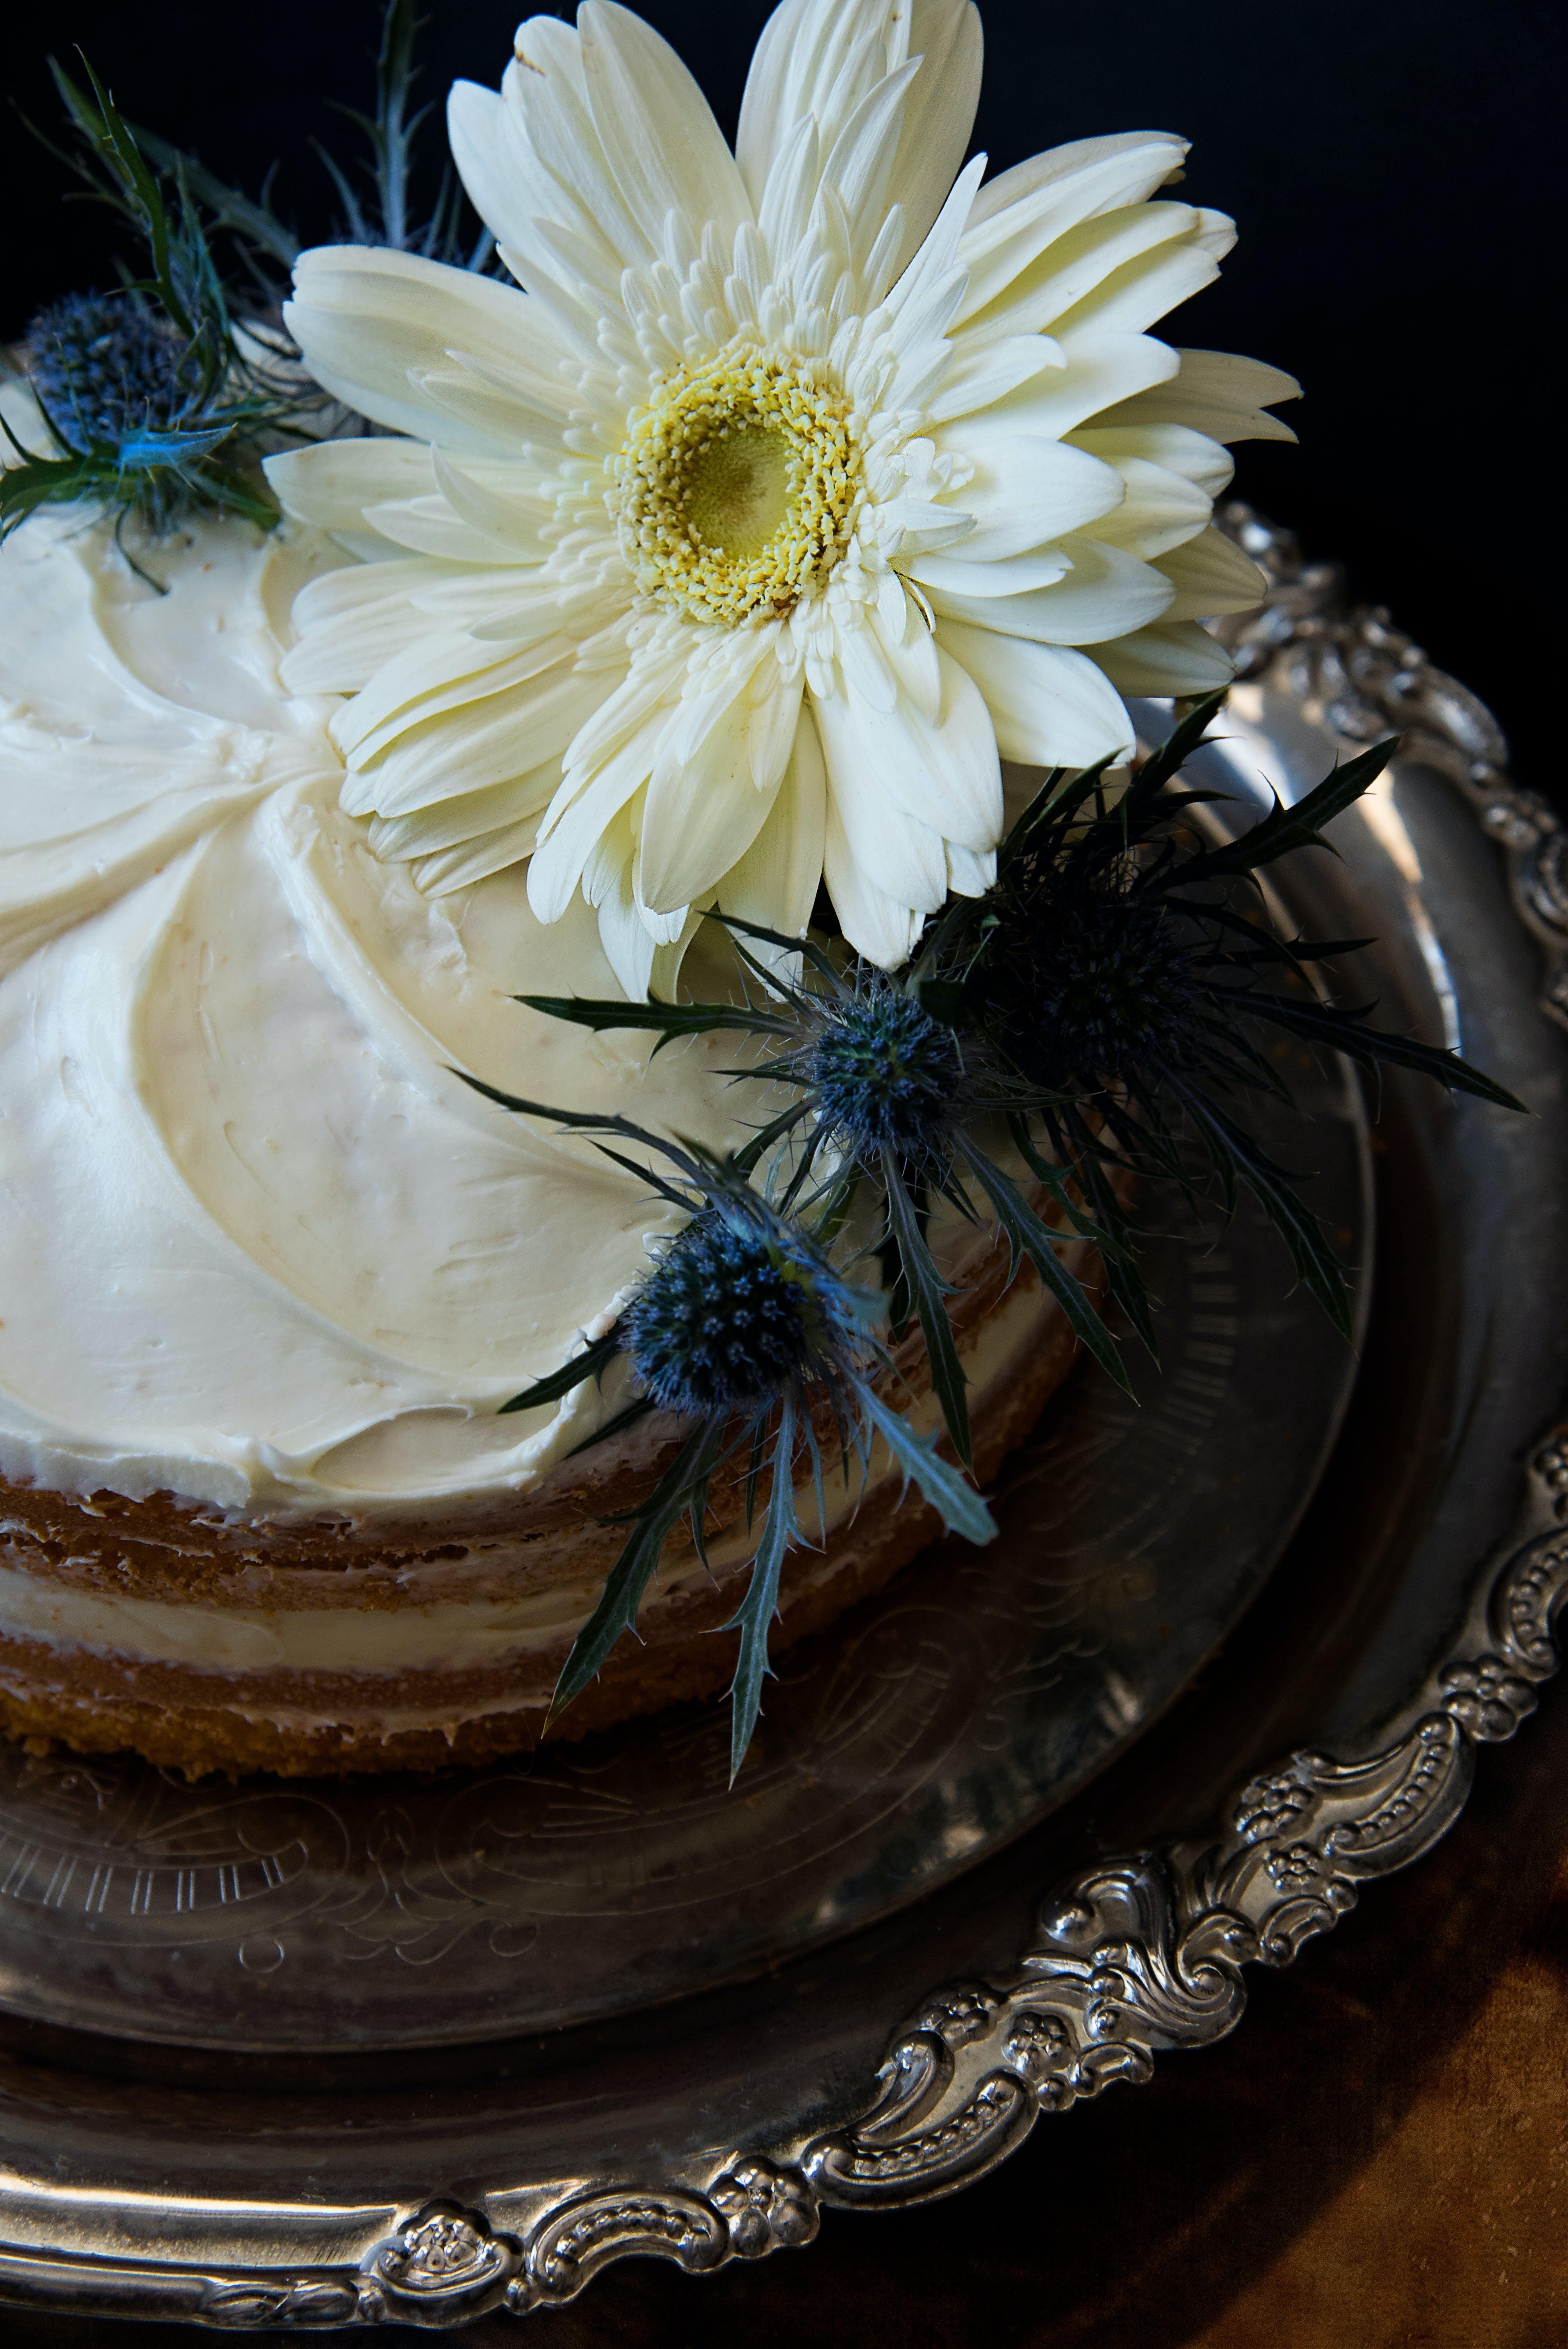 White Flowers on Round Cake With White Cream